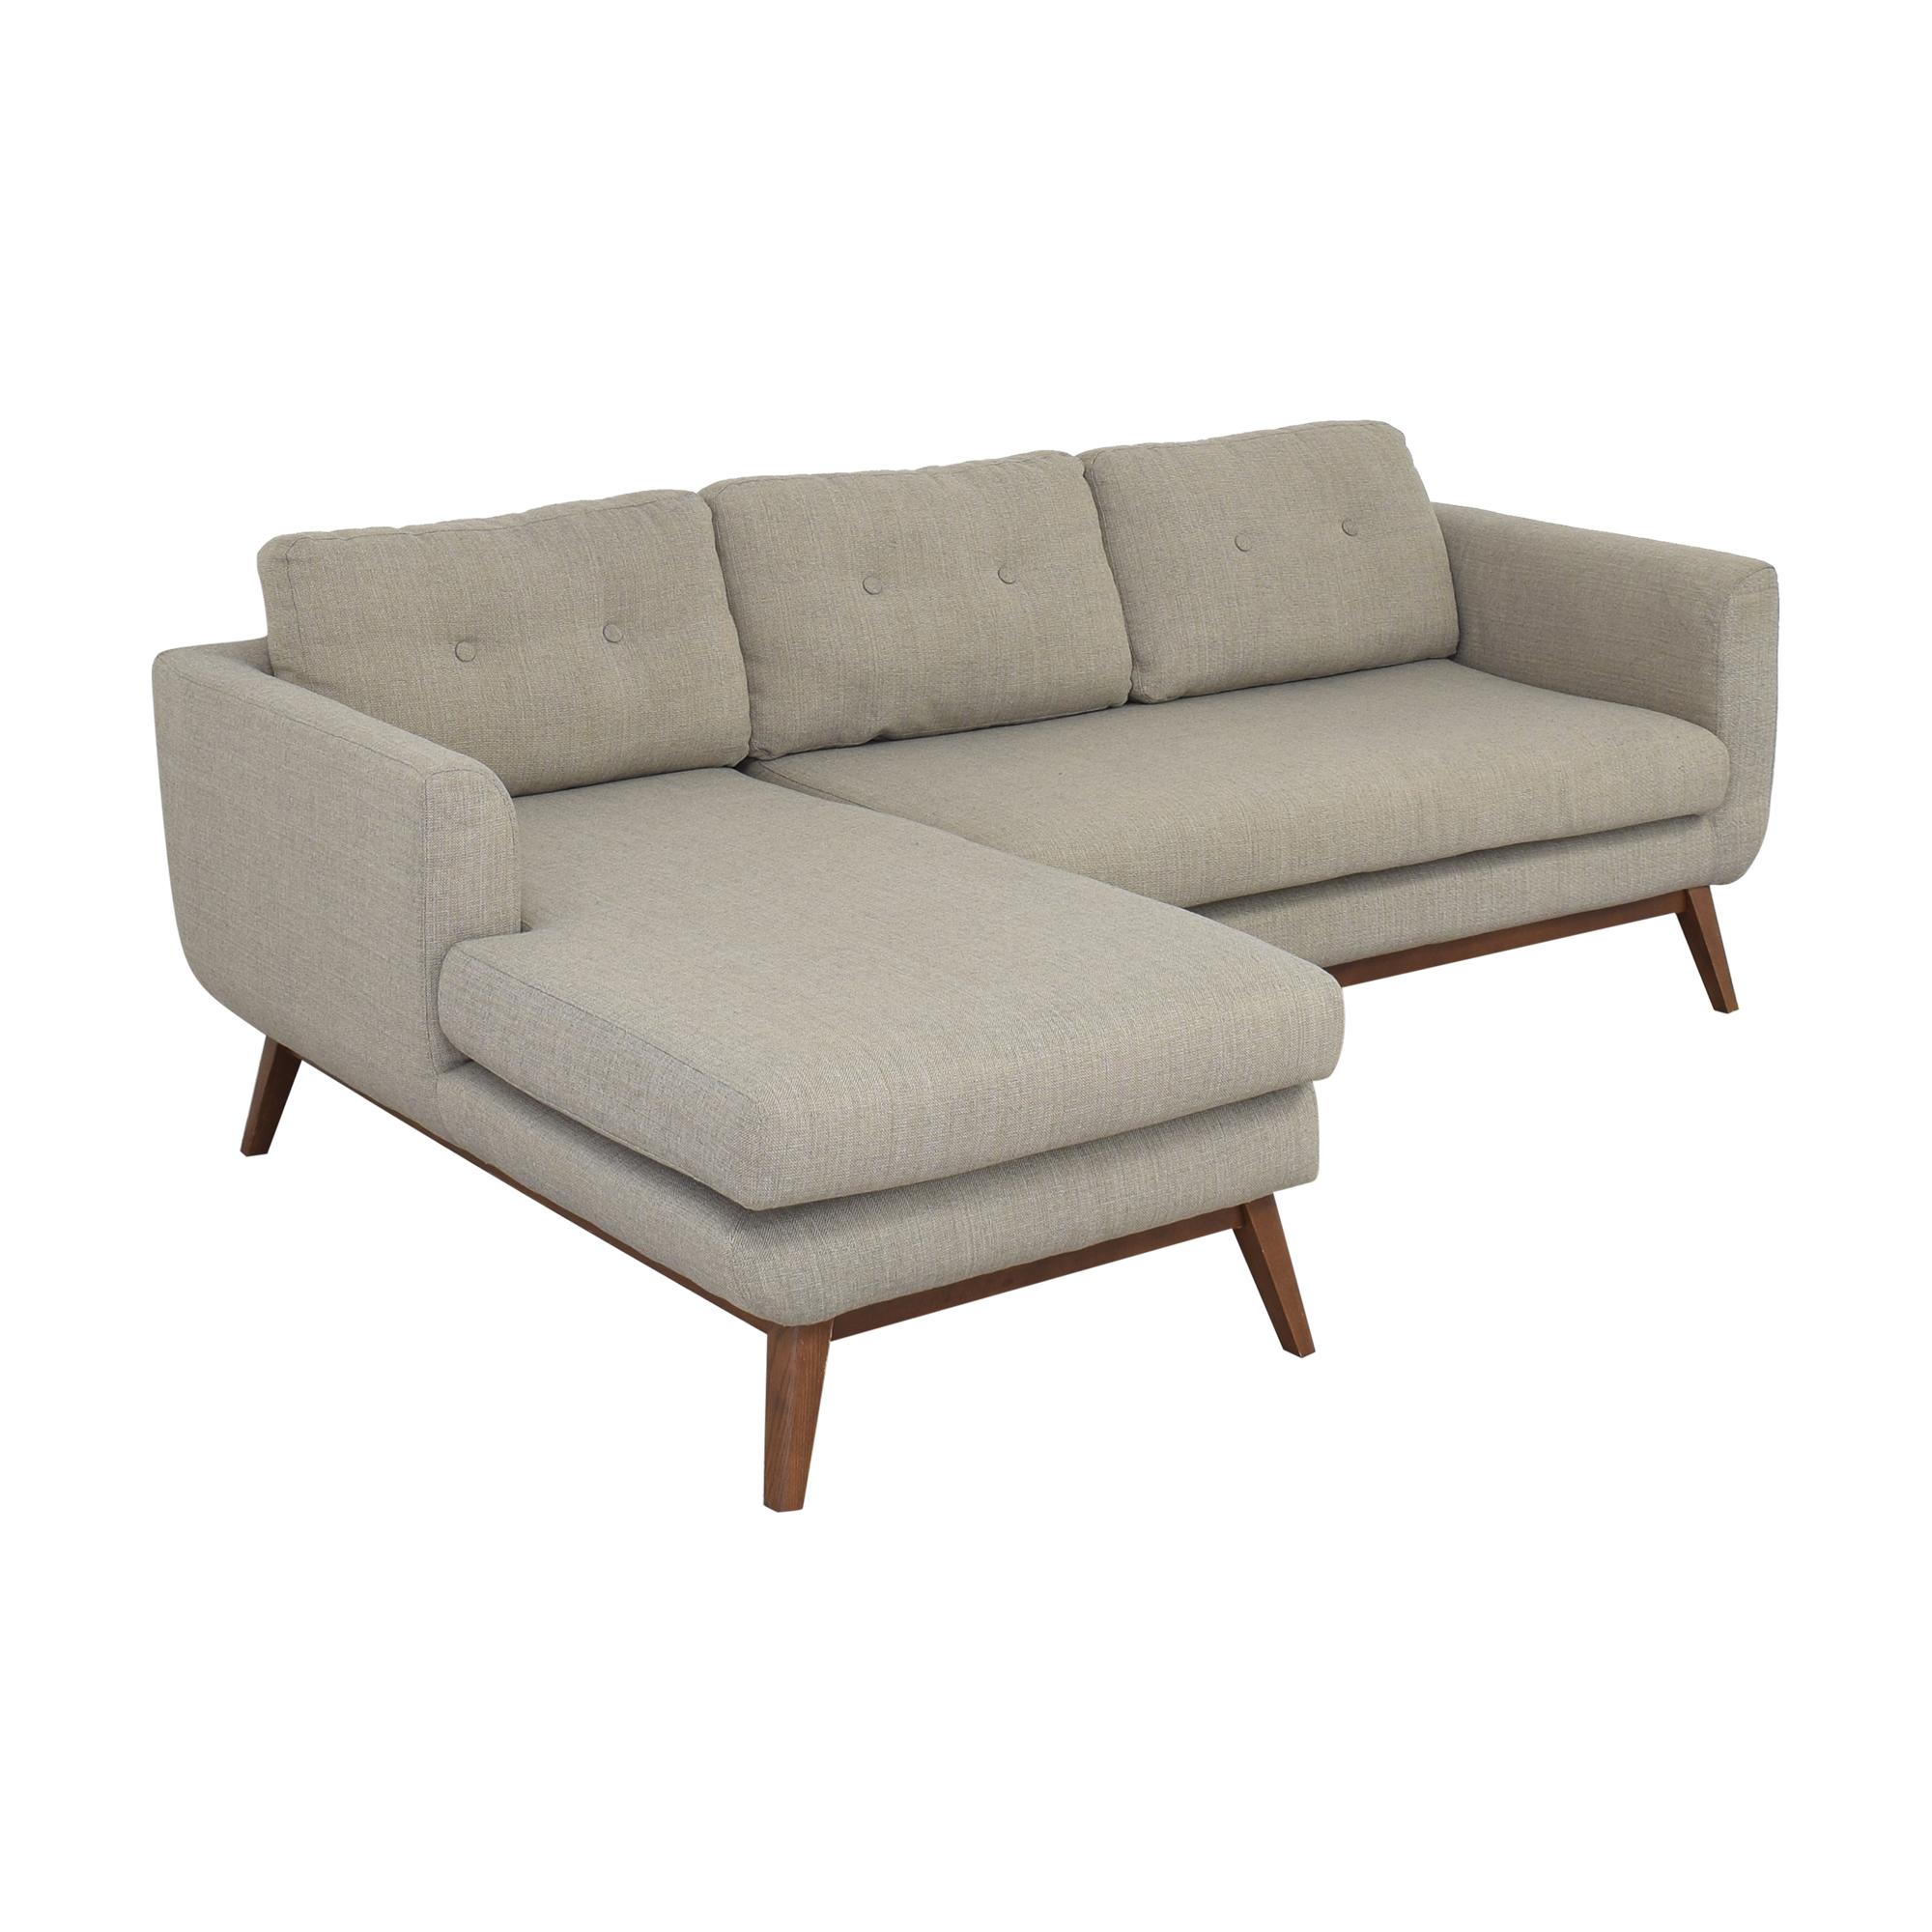 AllModern AllModern Keating Sofa and Chaise Sectional beige